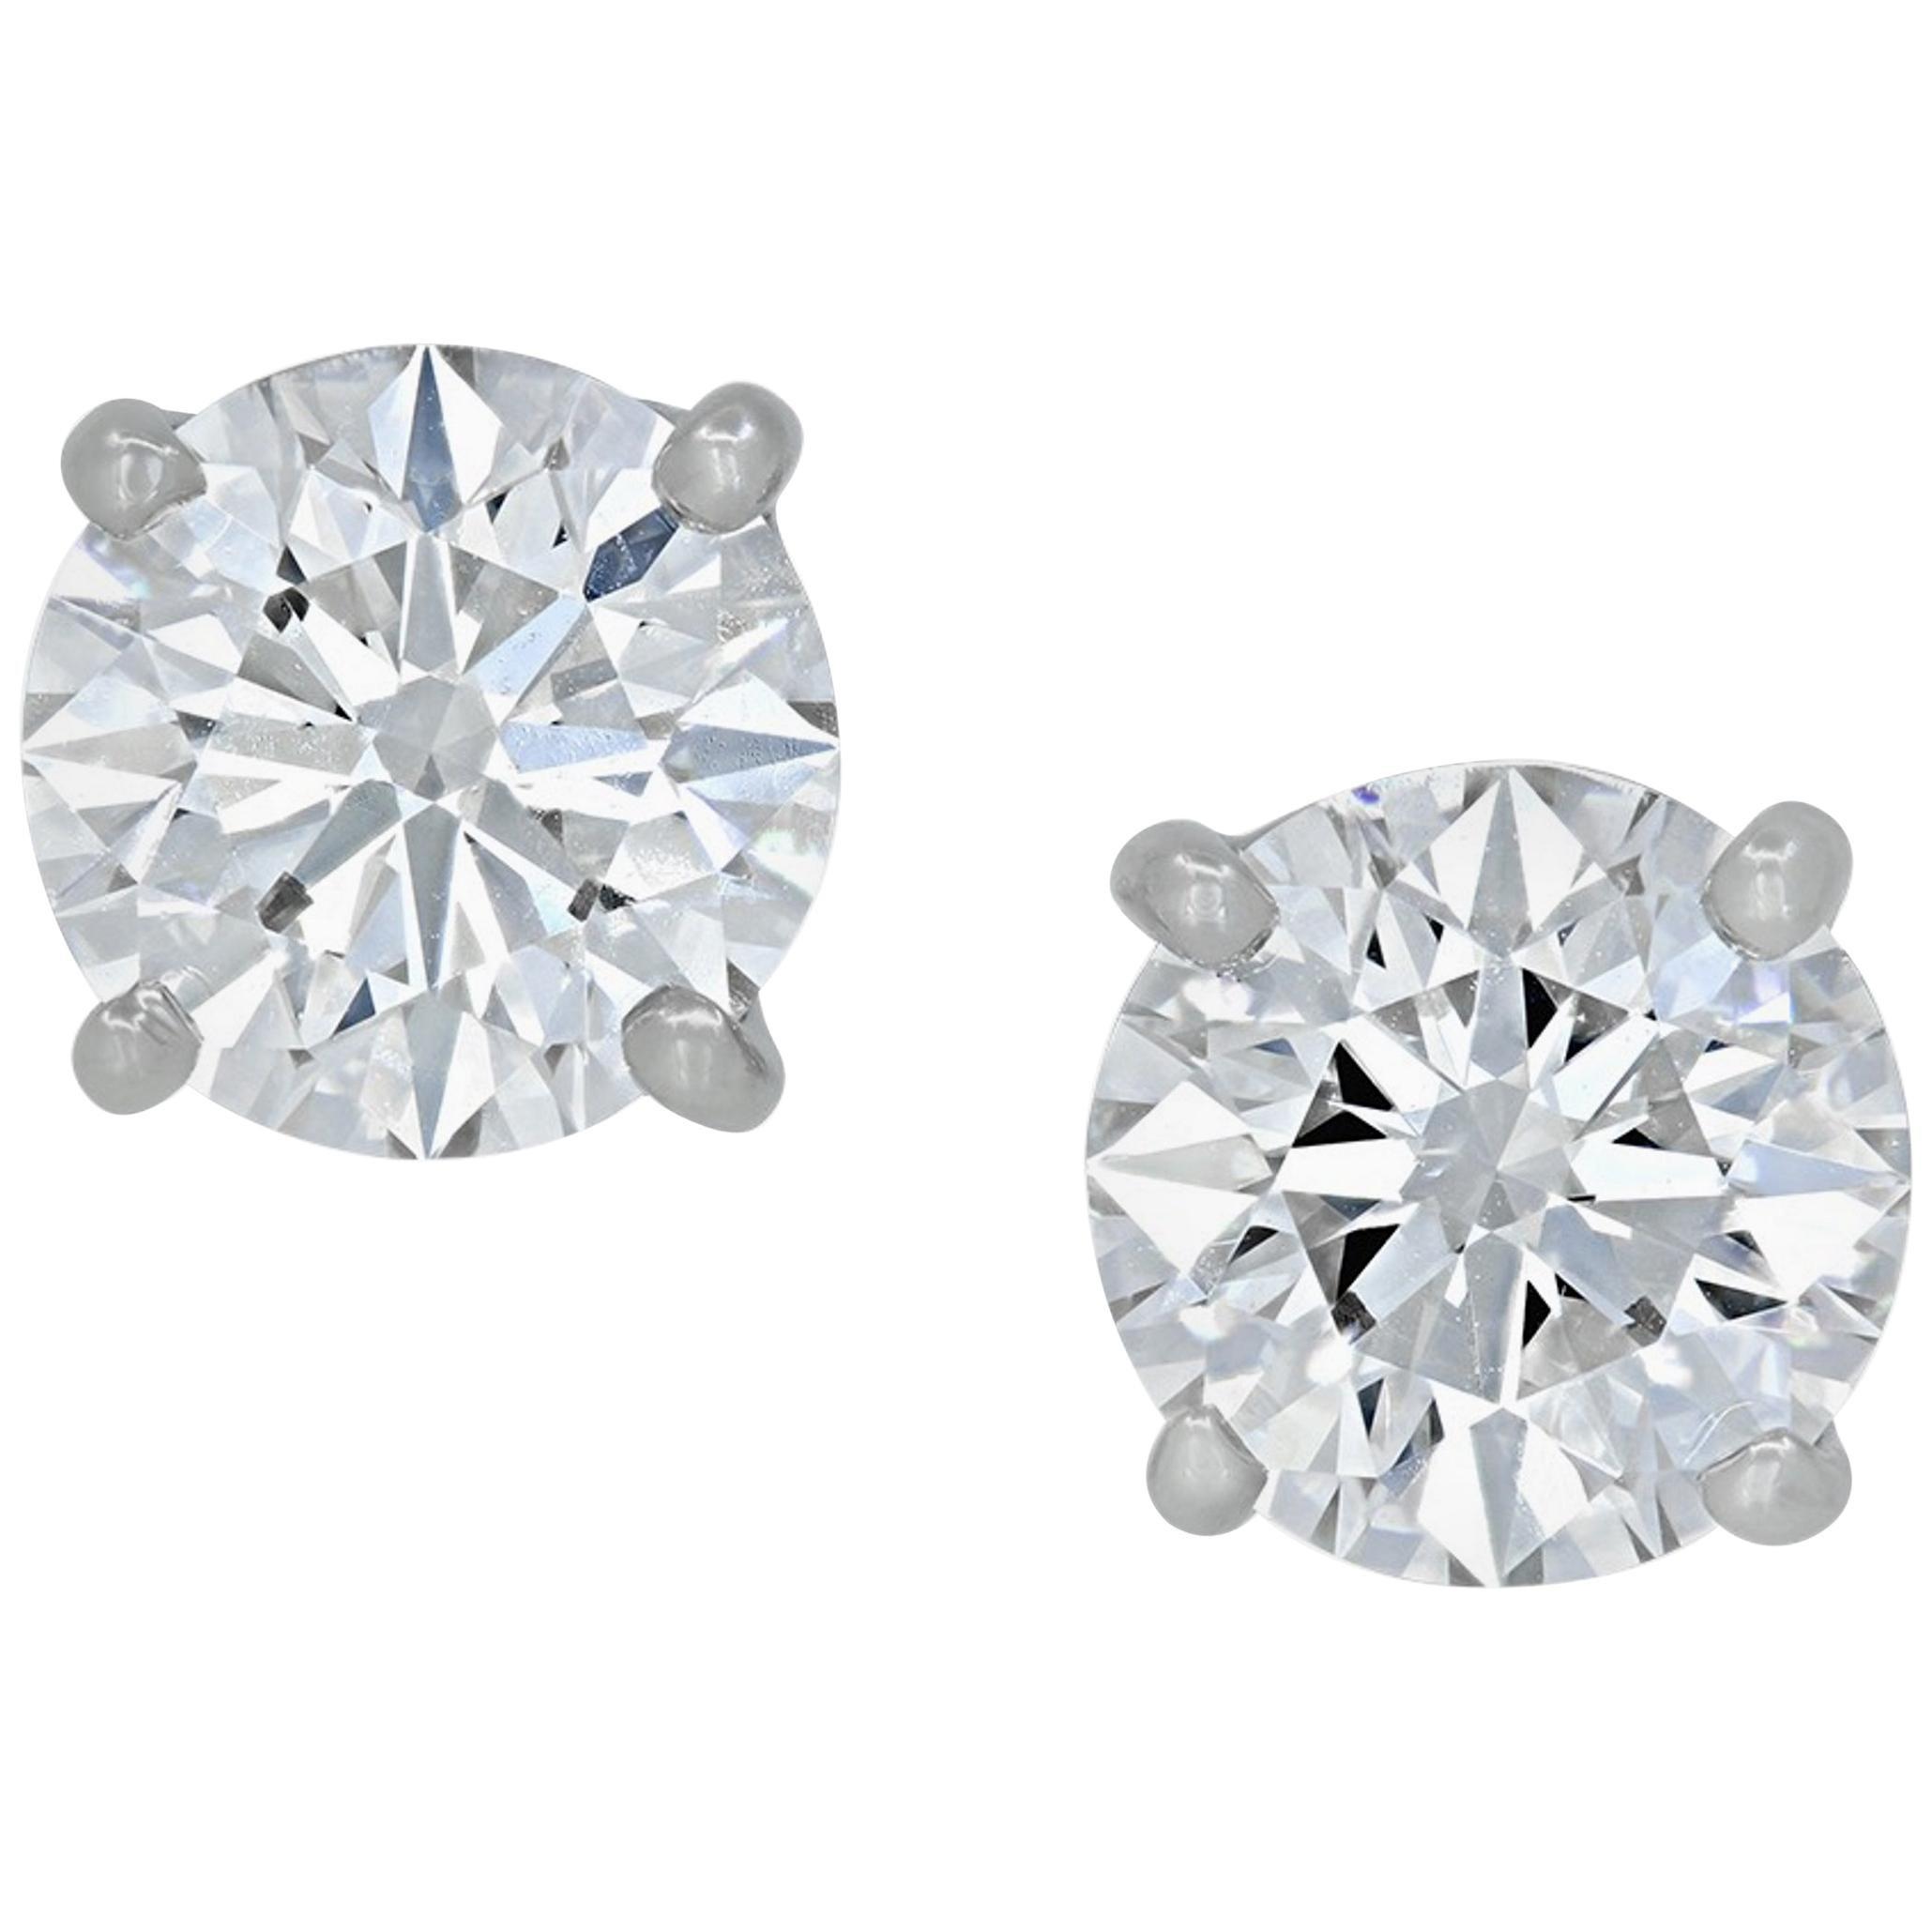 INTERNALLY FLAWLESS E/F Color GIA Certified Diamond Studs